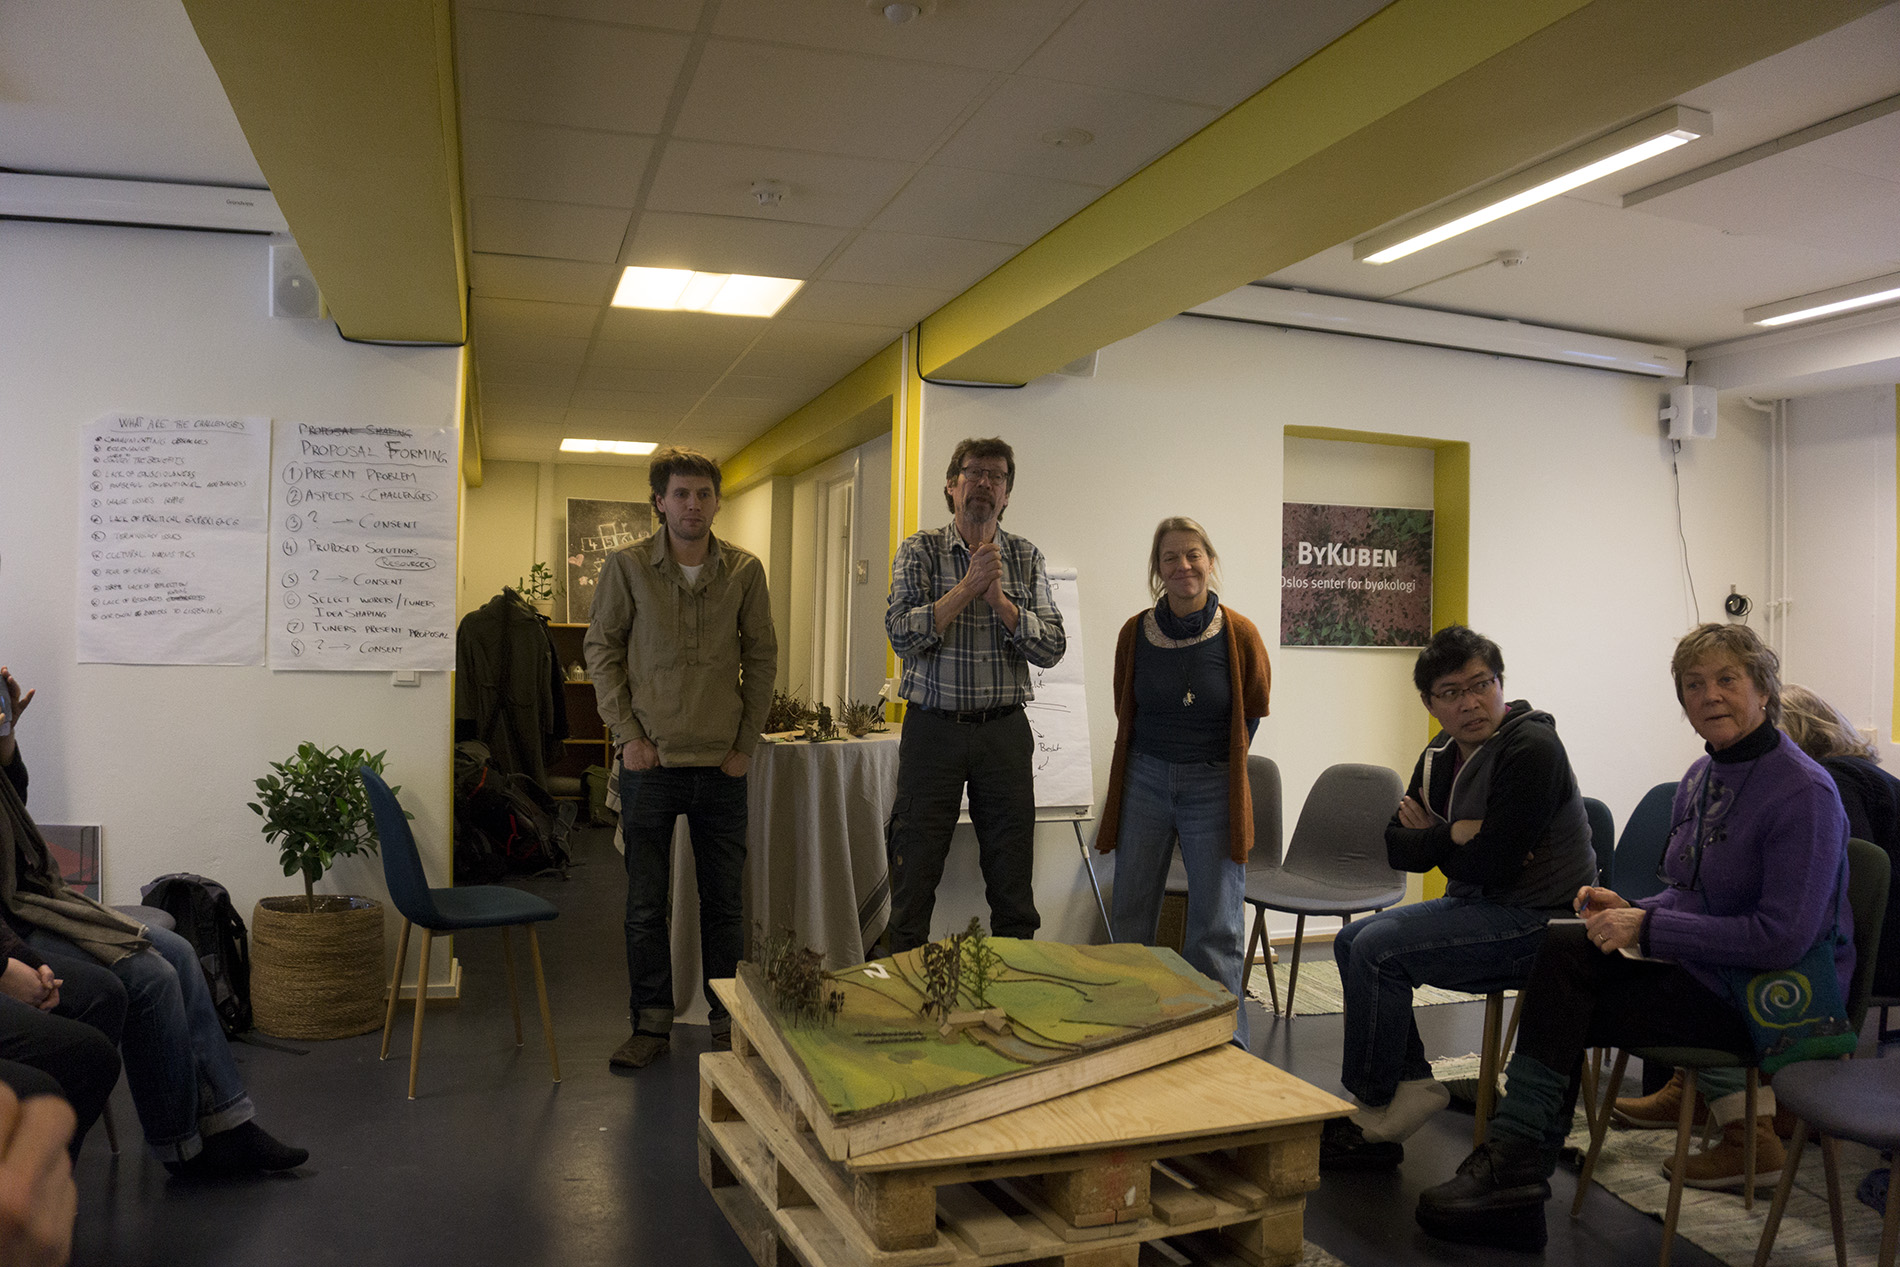 Jona Elfdahl presenting his Diploma work